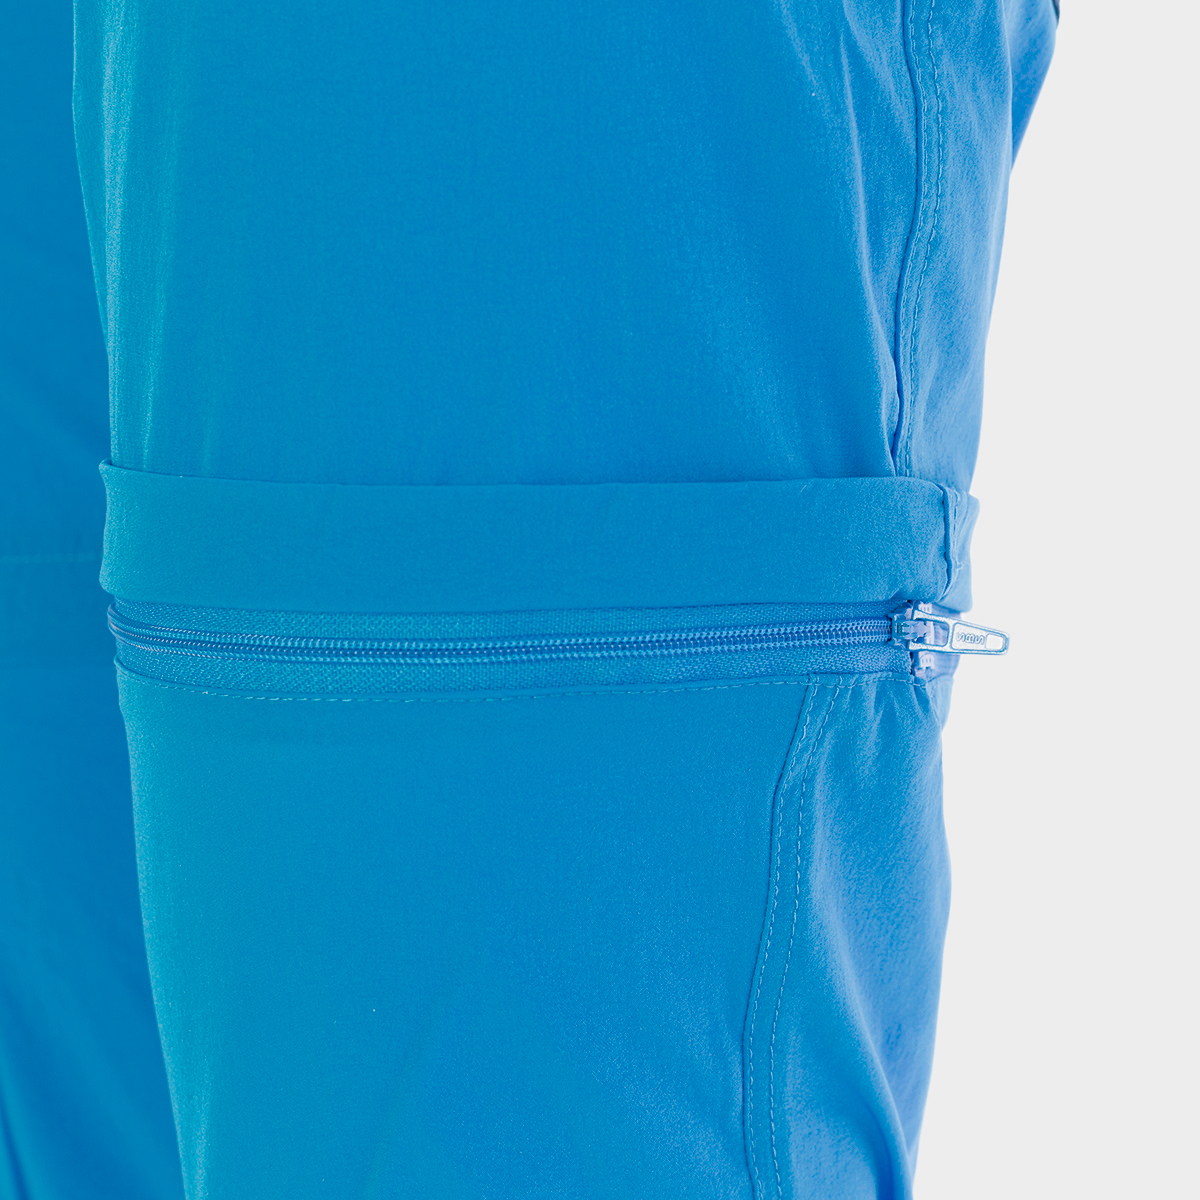 MAN'S KOBUK STRETCH PANT, DETACHABLE BLUE